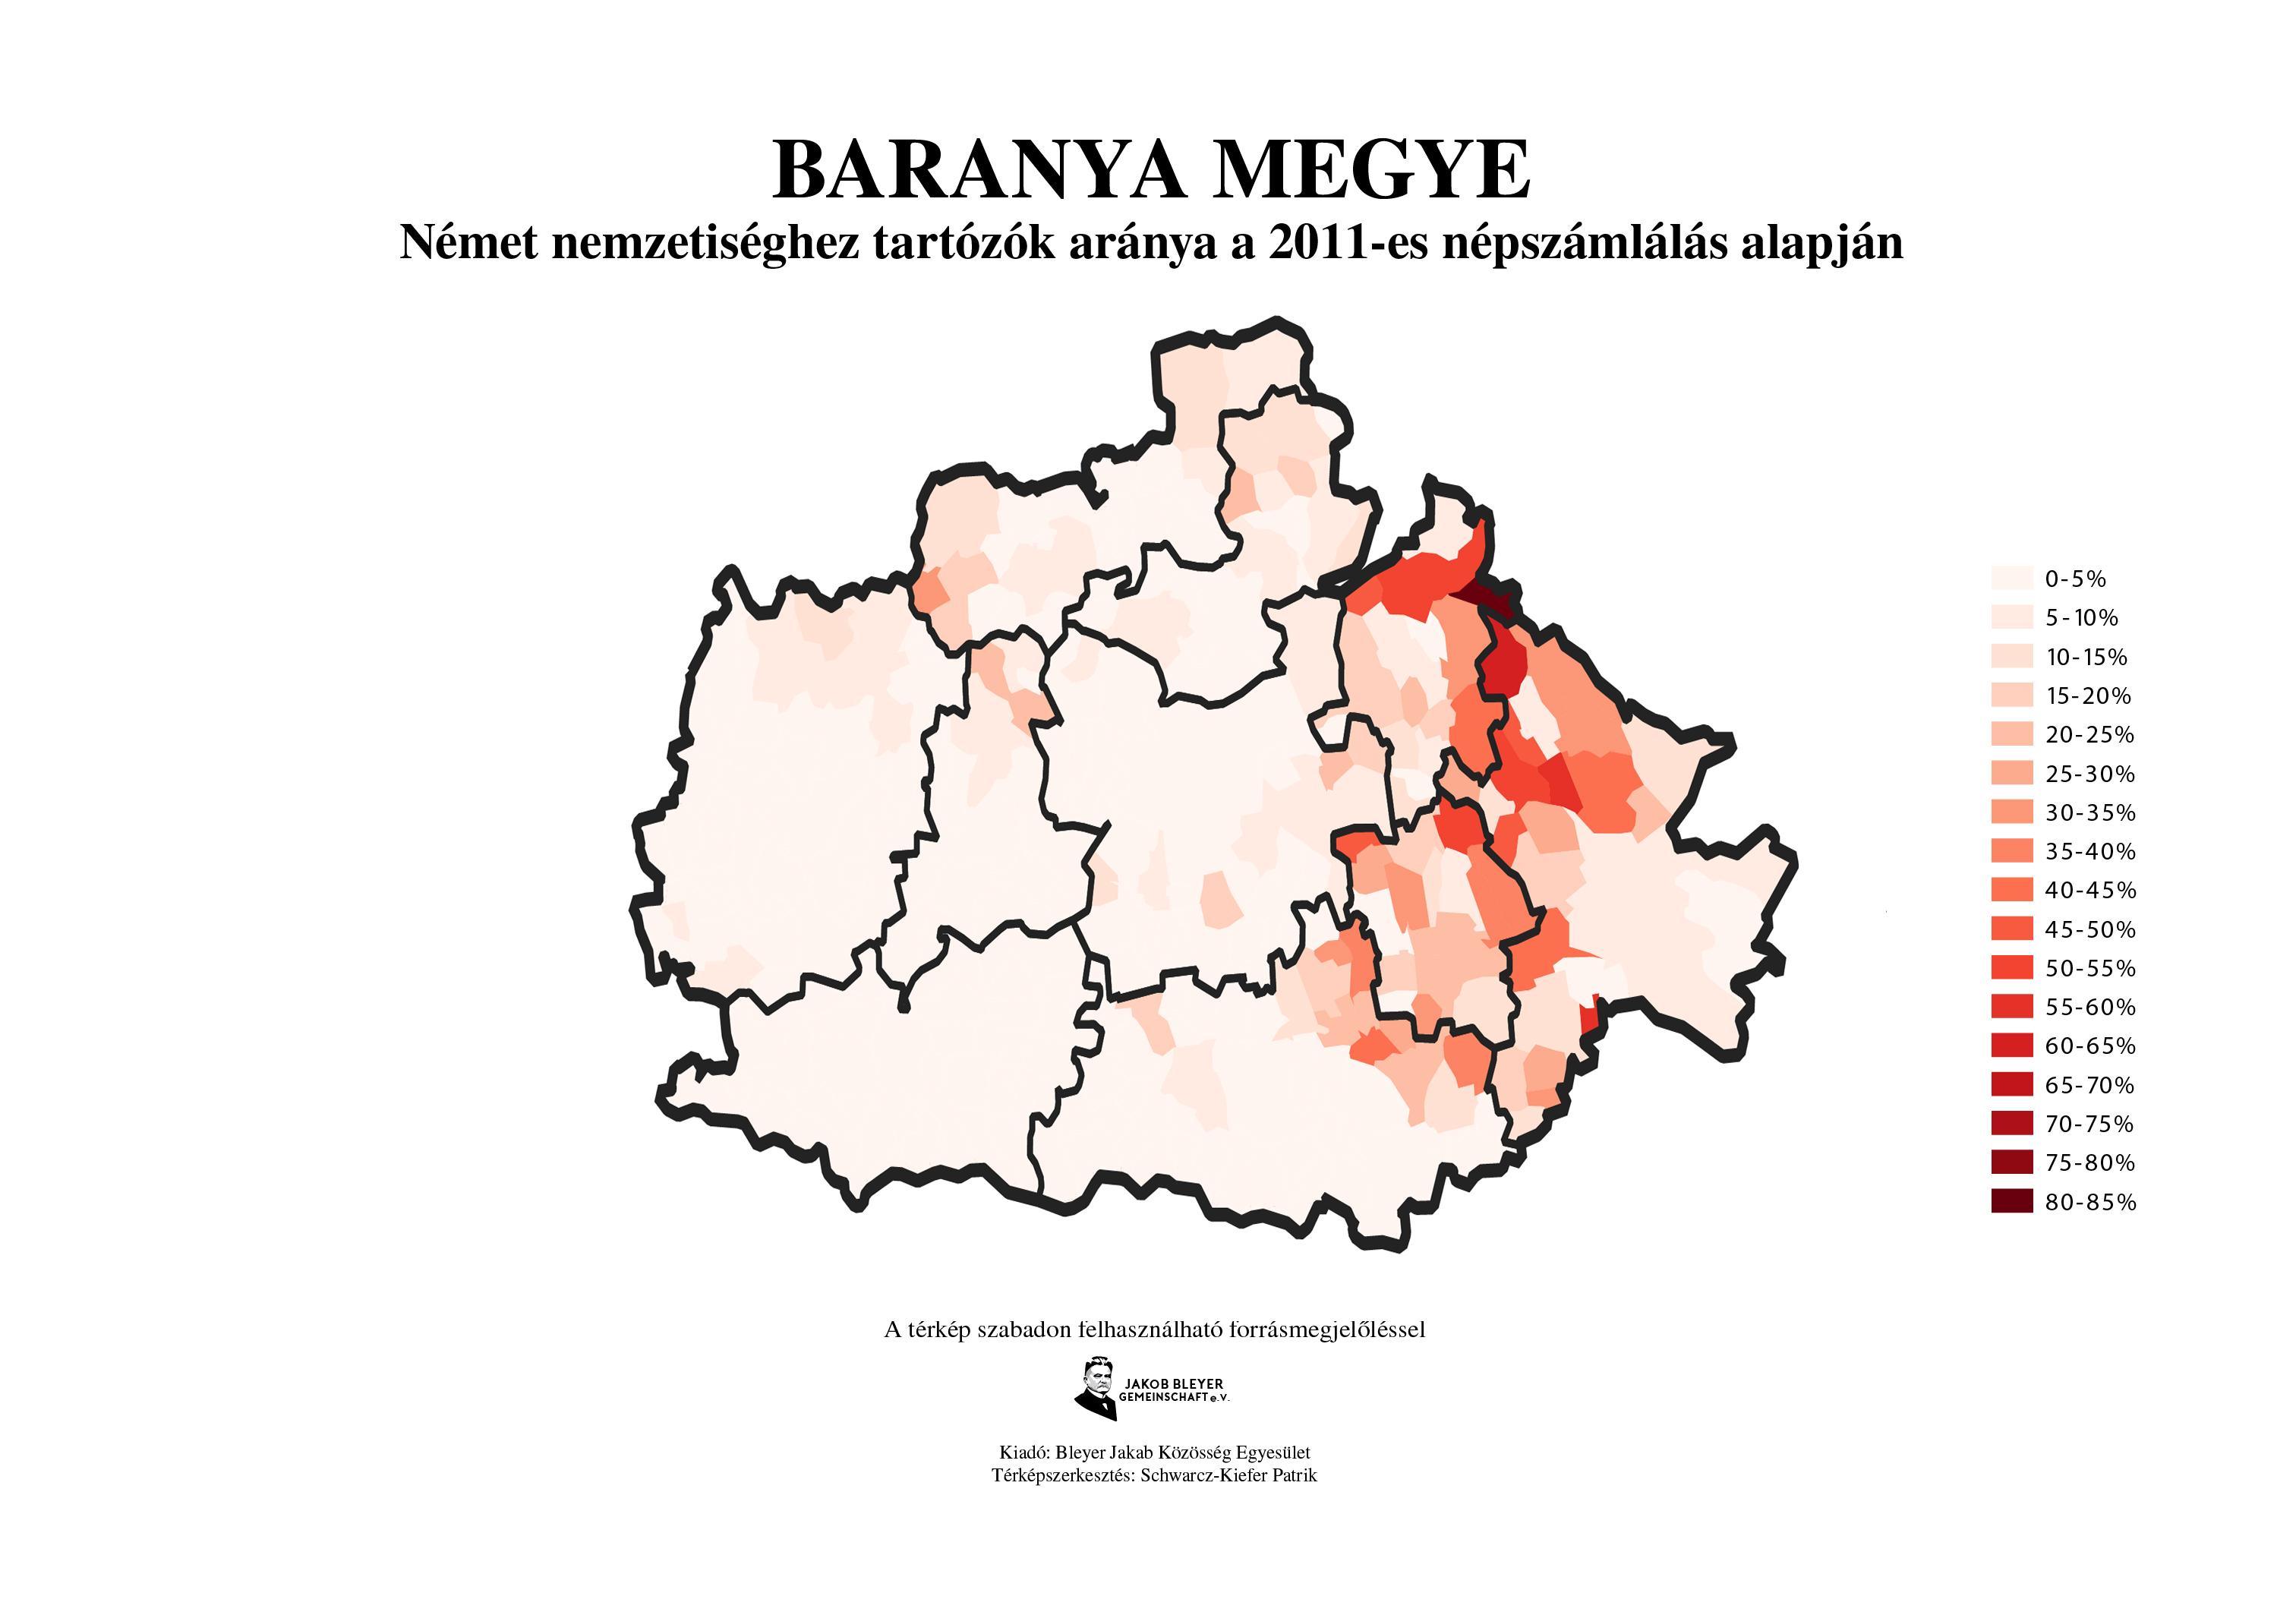 File Baranya Megyei Nemetek Jpg Wikimedia Commons